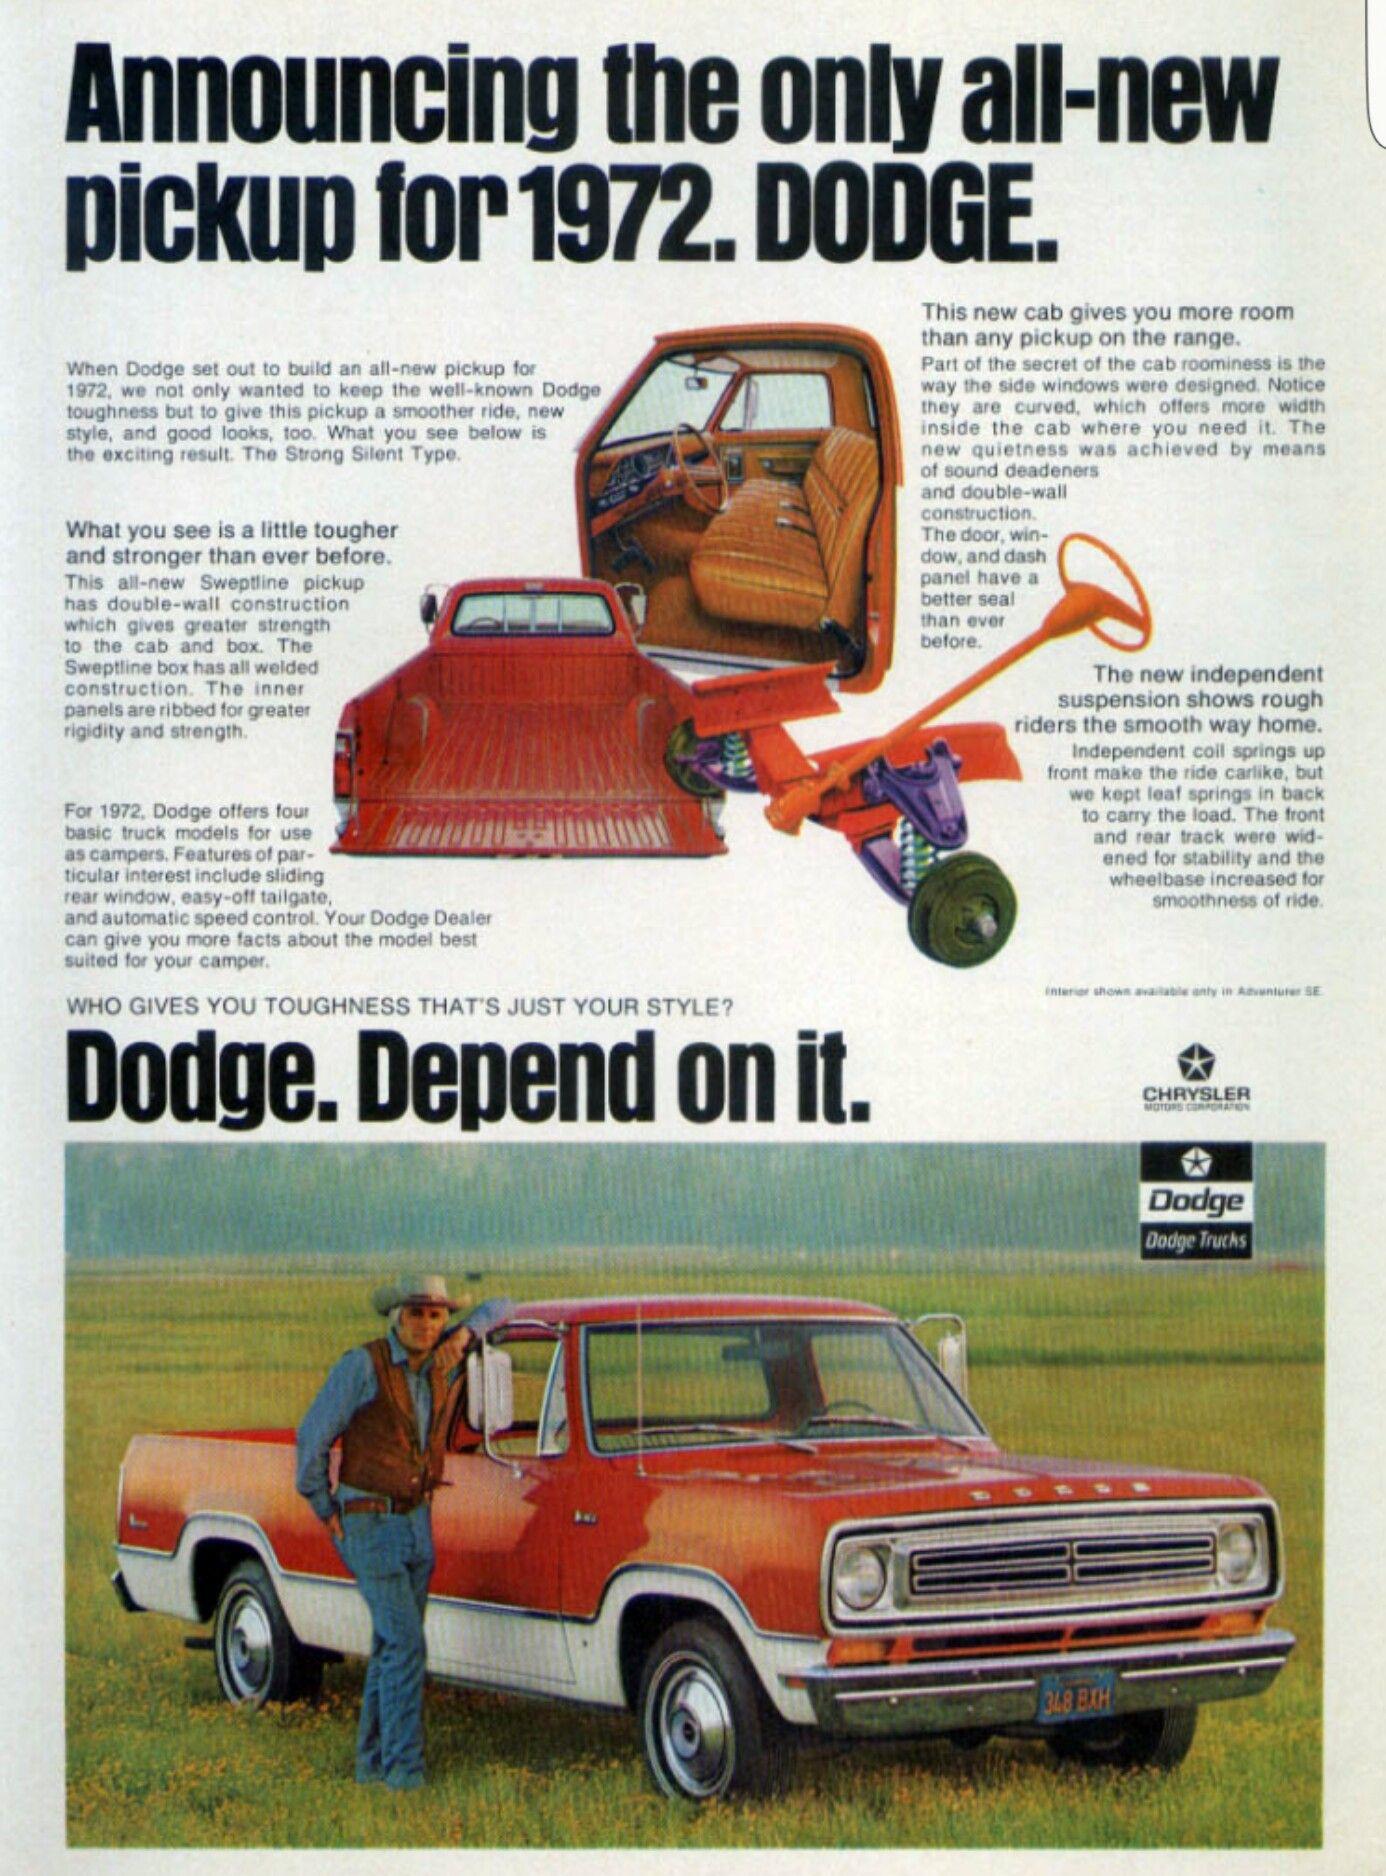 1972 Dodge Pick-Up | classic car ads | Pinterest | Mopar, Cars and ...